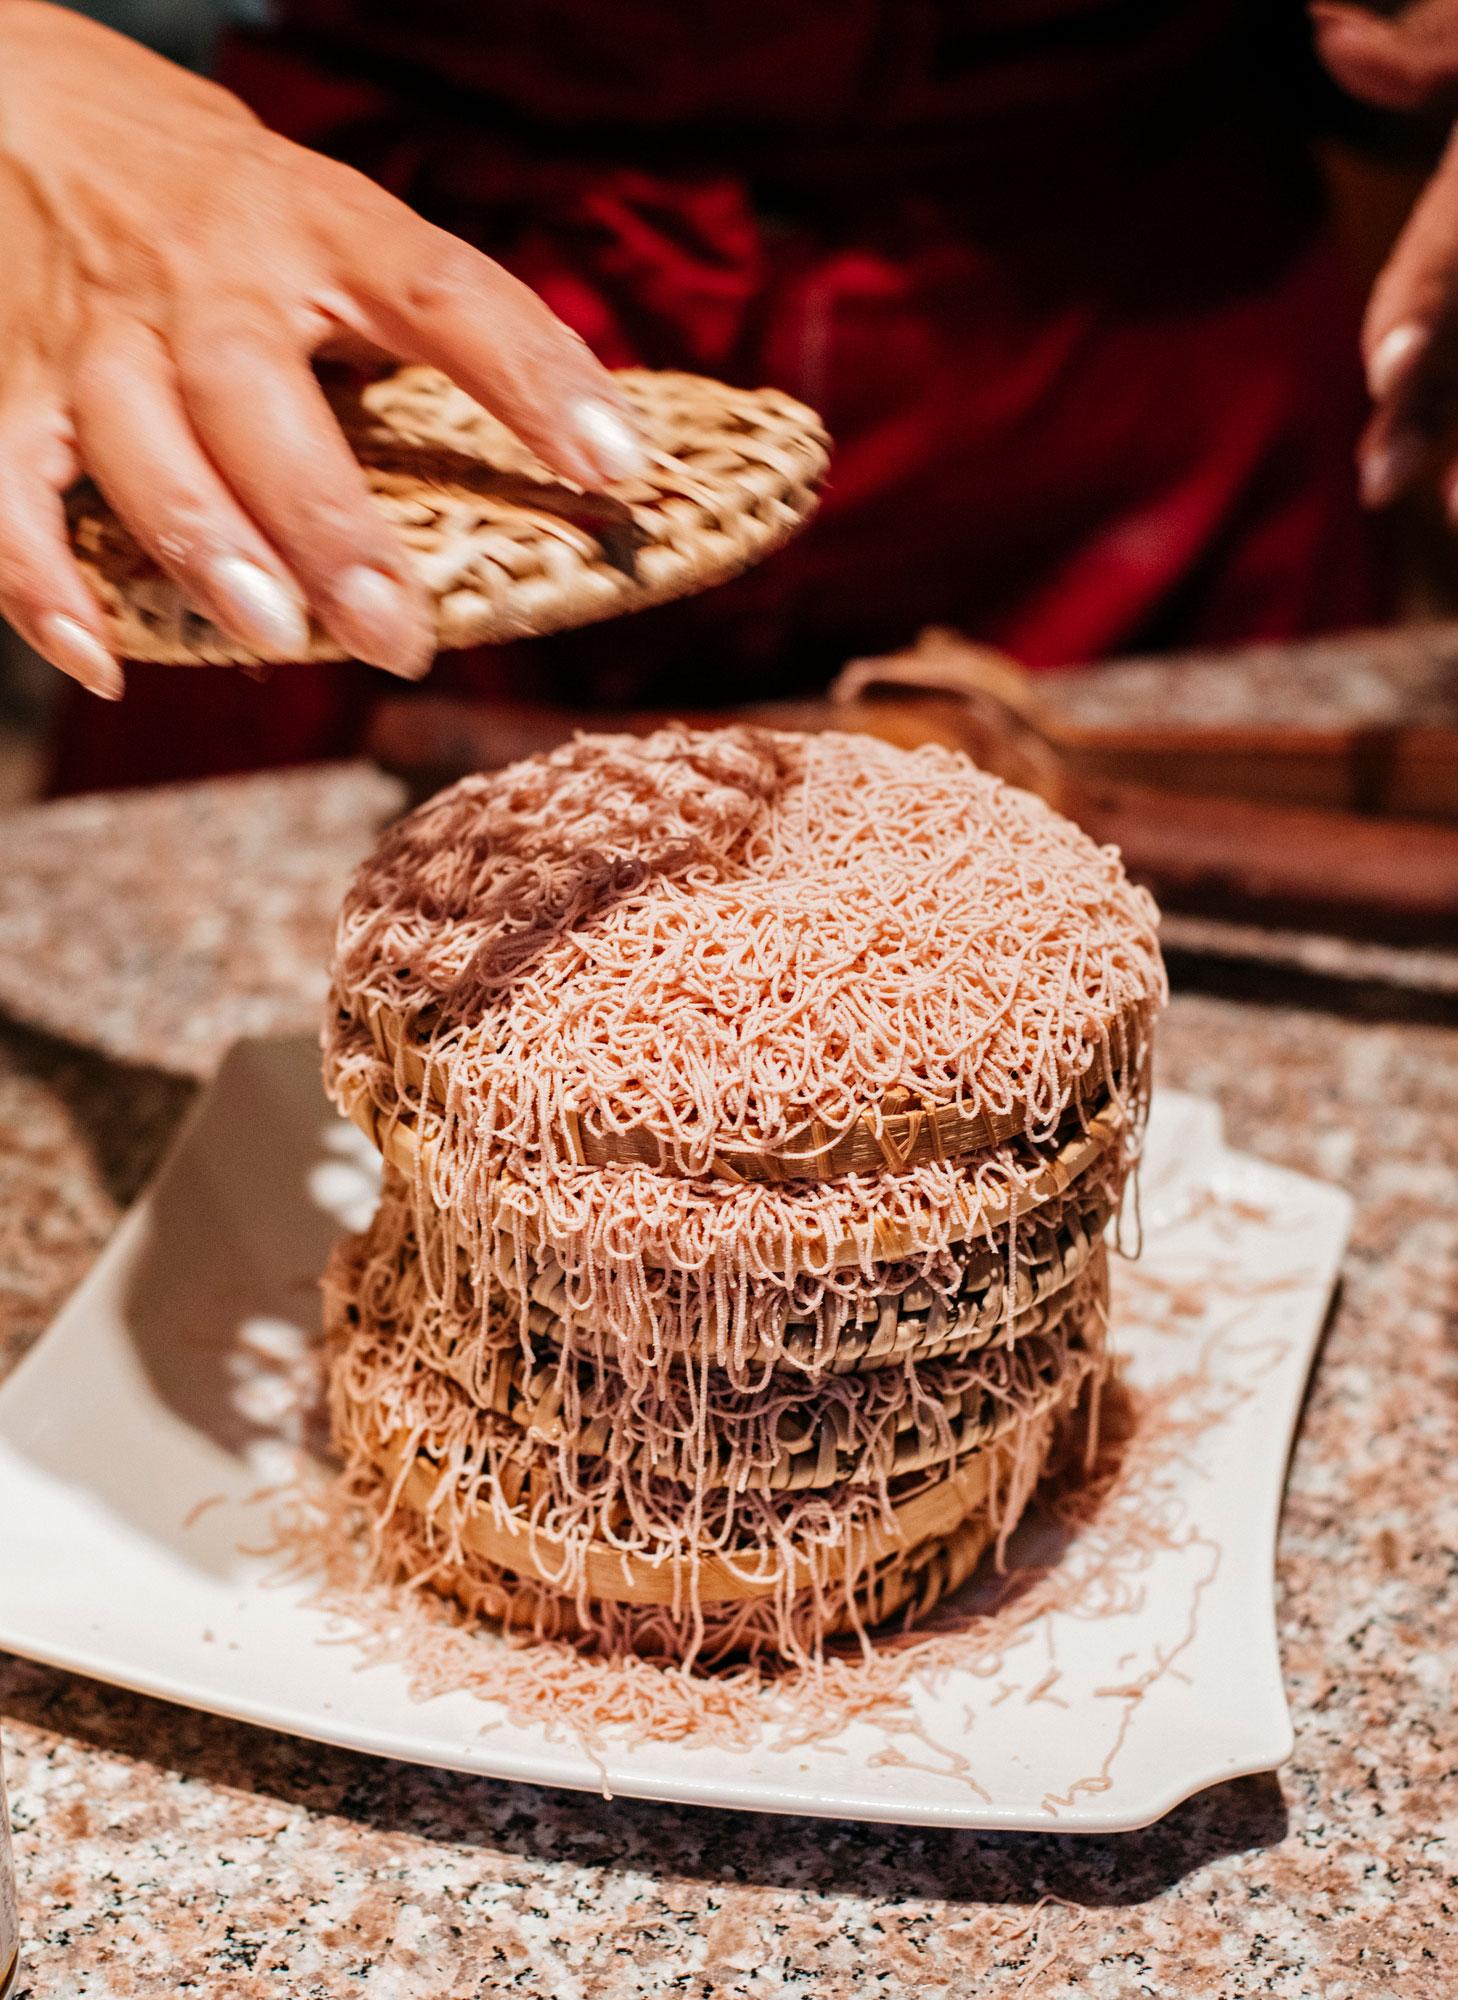 Los_Angeles_Food_photographer_Rebecca_Peloquin_Sri_Lankan_Food_017.JPG